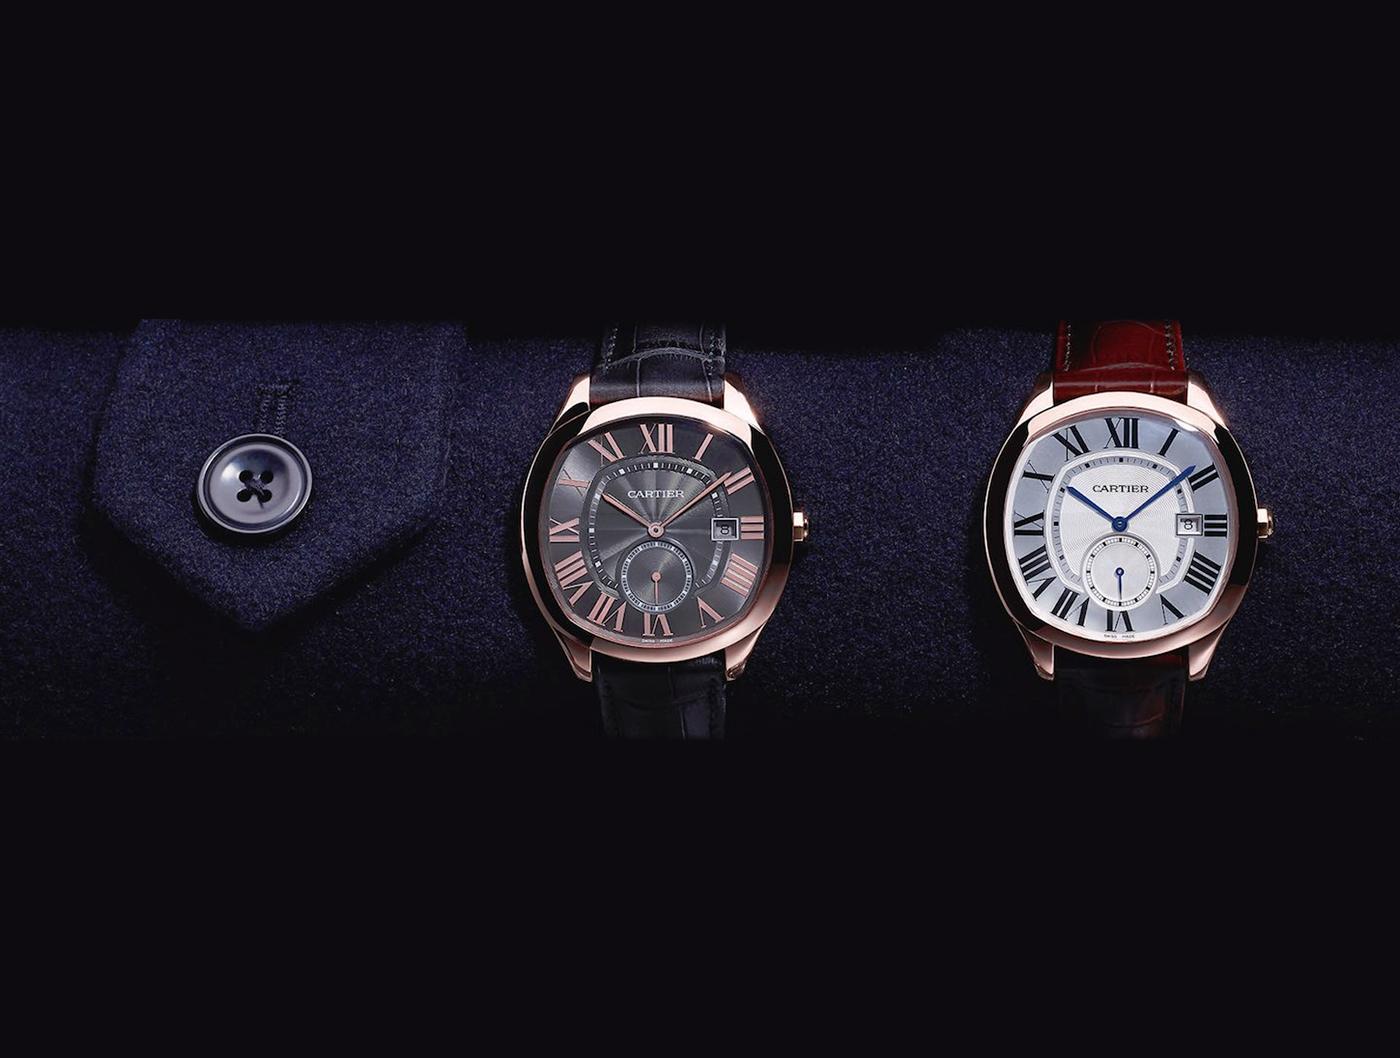 due modelli di orologi Cartier su manica maschile a pitti uomo firenze